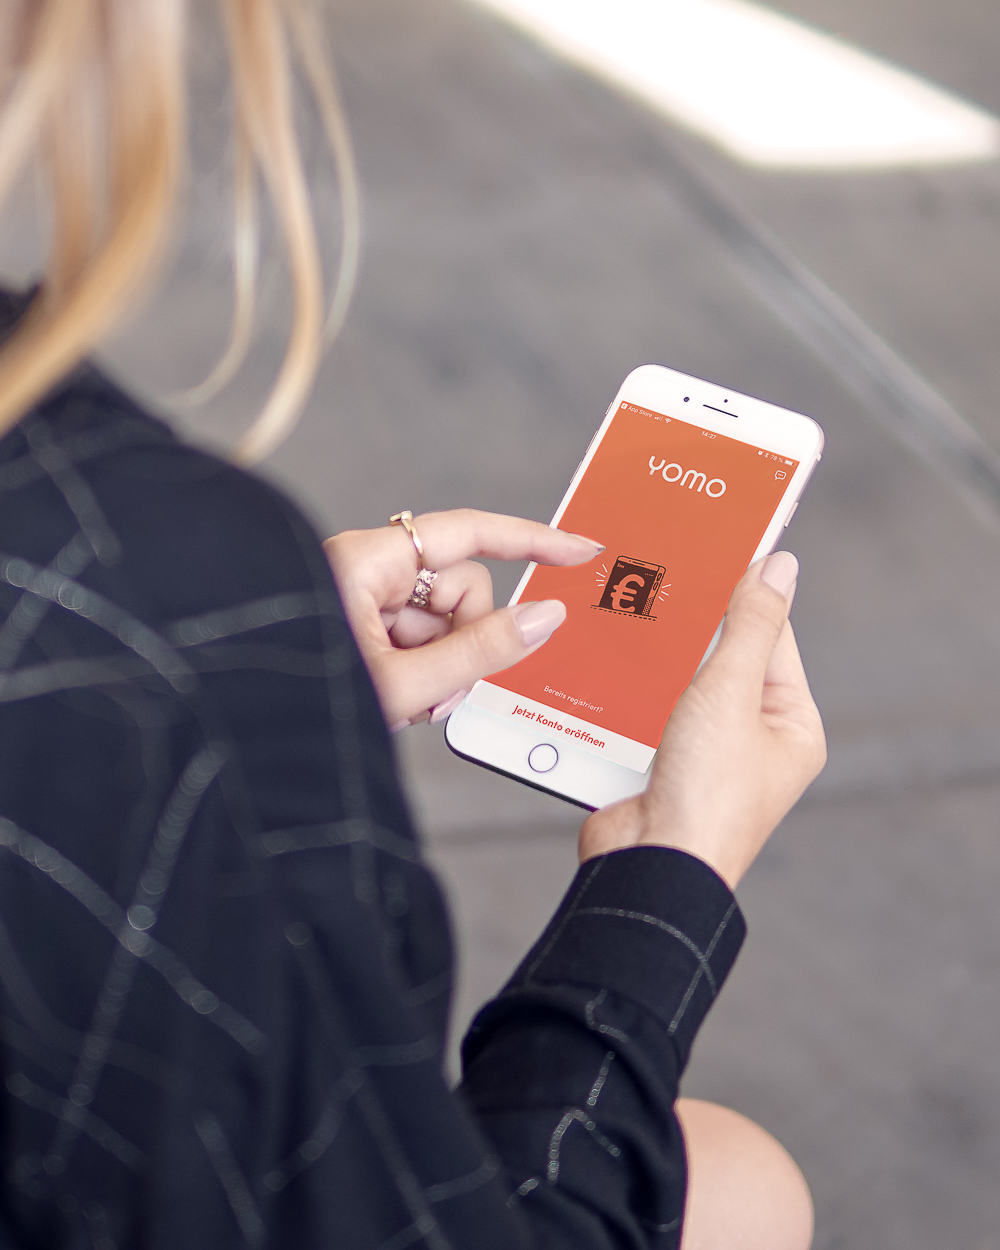 Yomo App Mobile Banking für das Smartphone